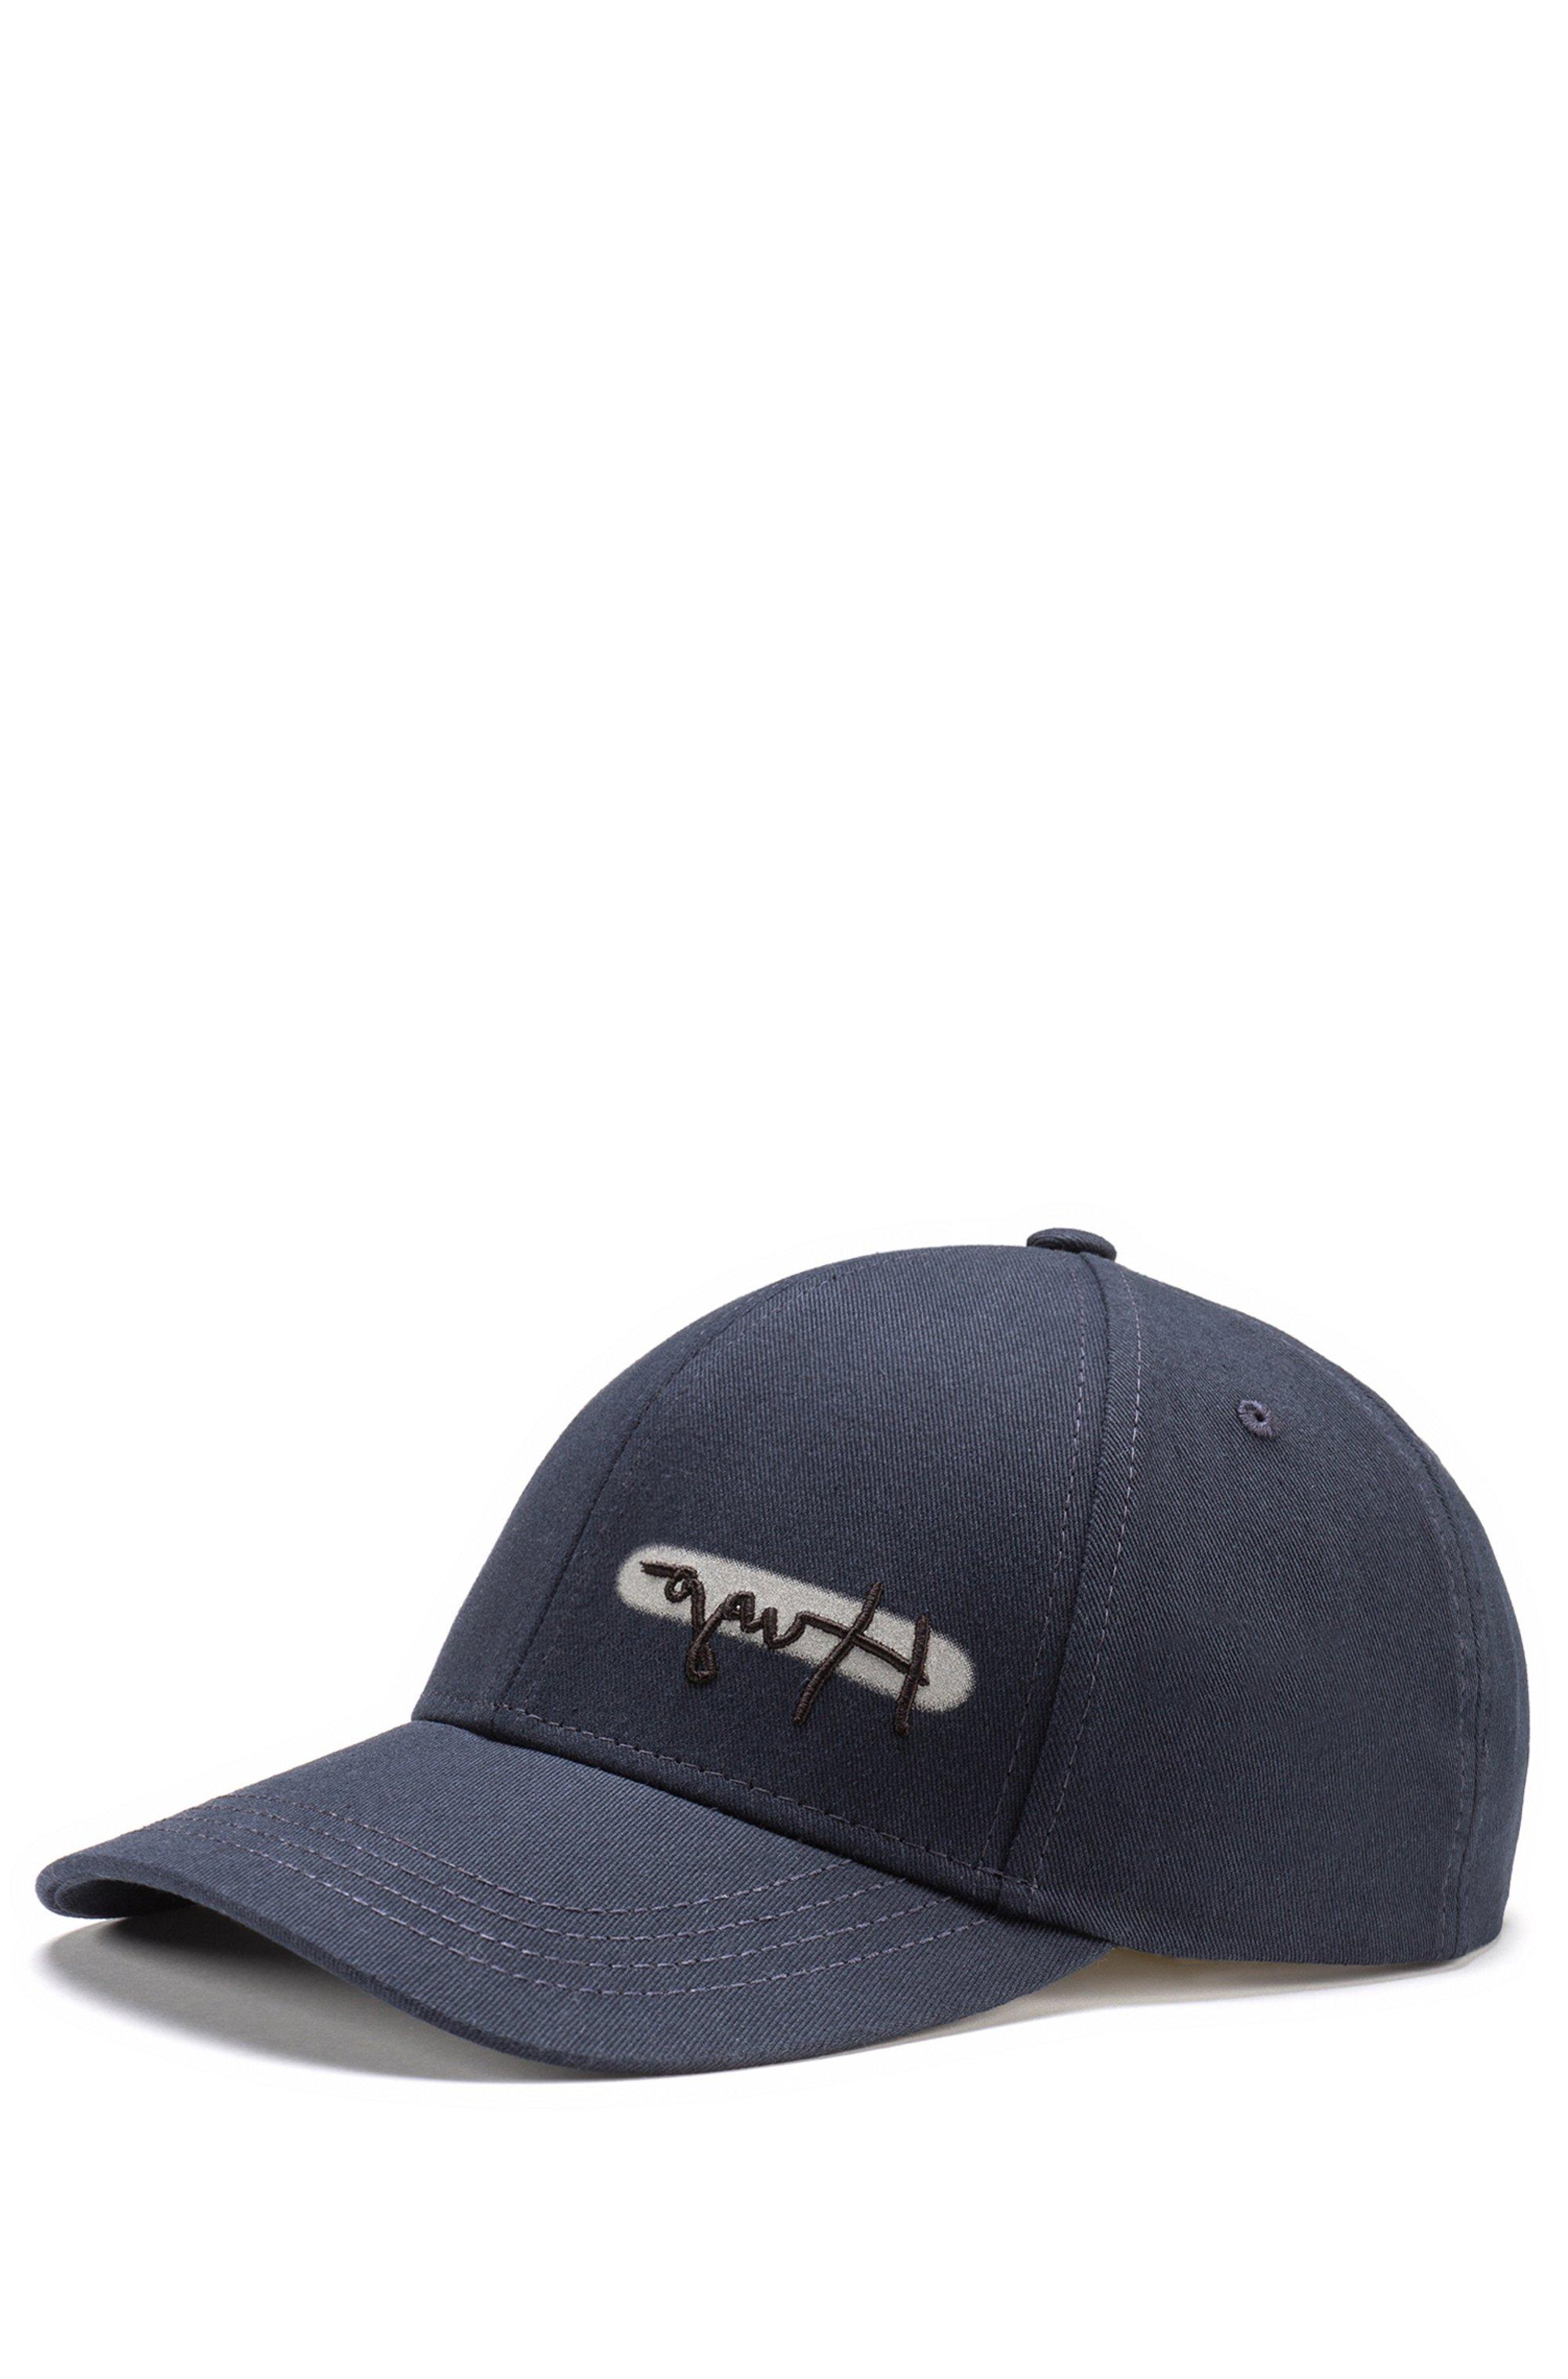 Cotton-twill logo cap with reflective spray print